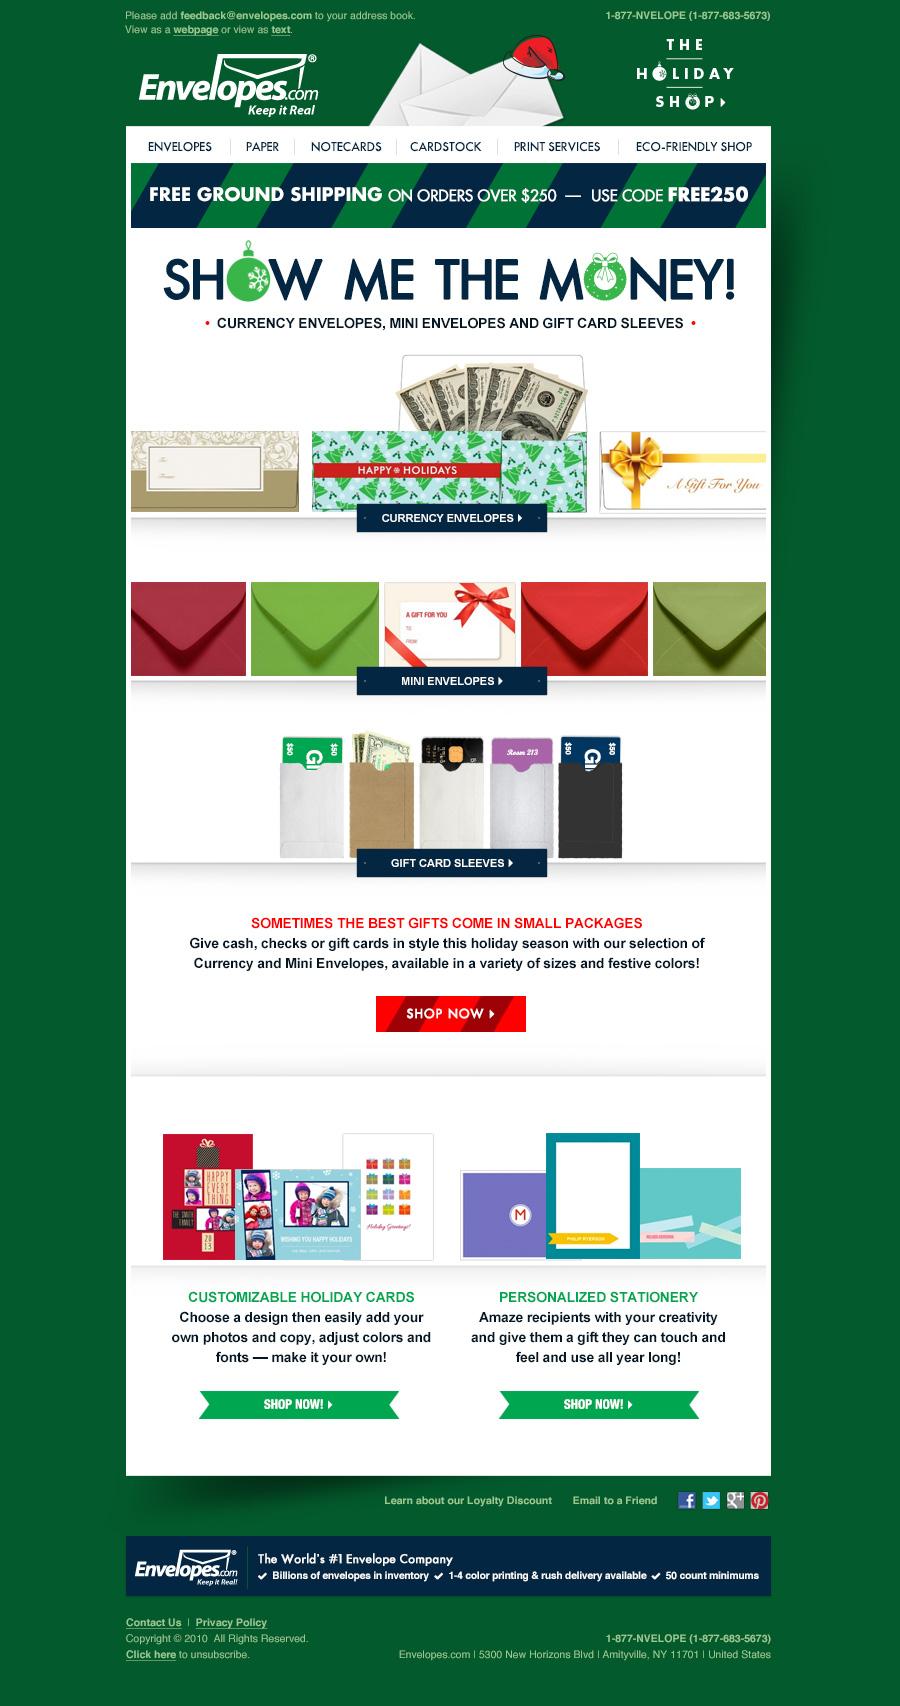 Holiday_Minis_email_v1.jpg